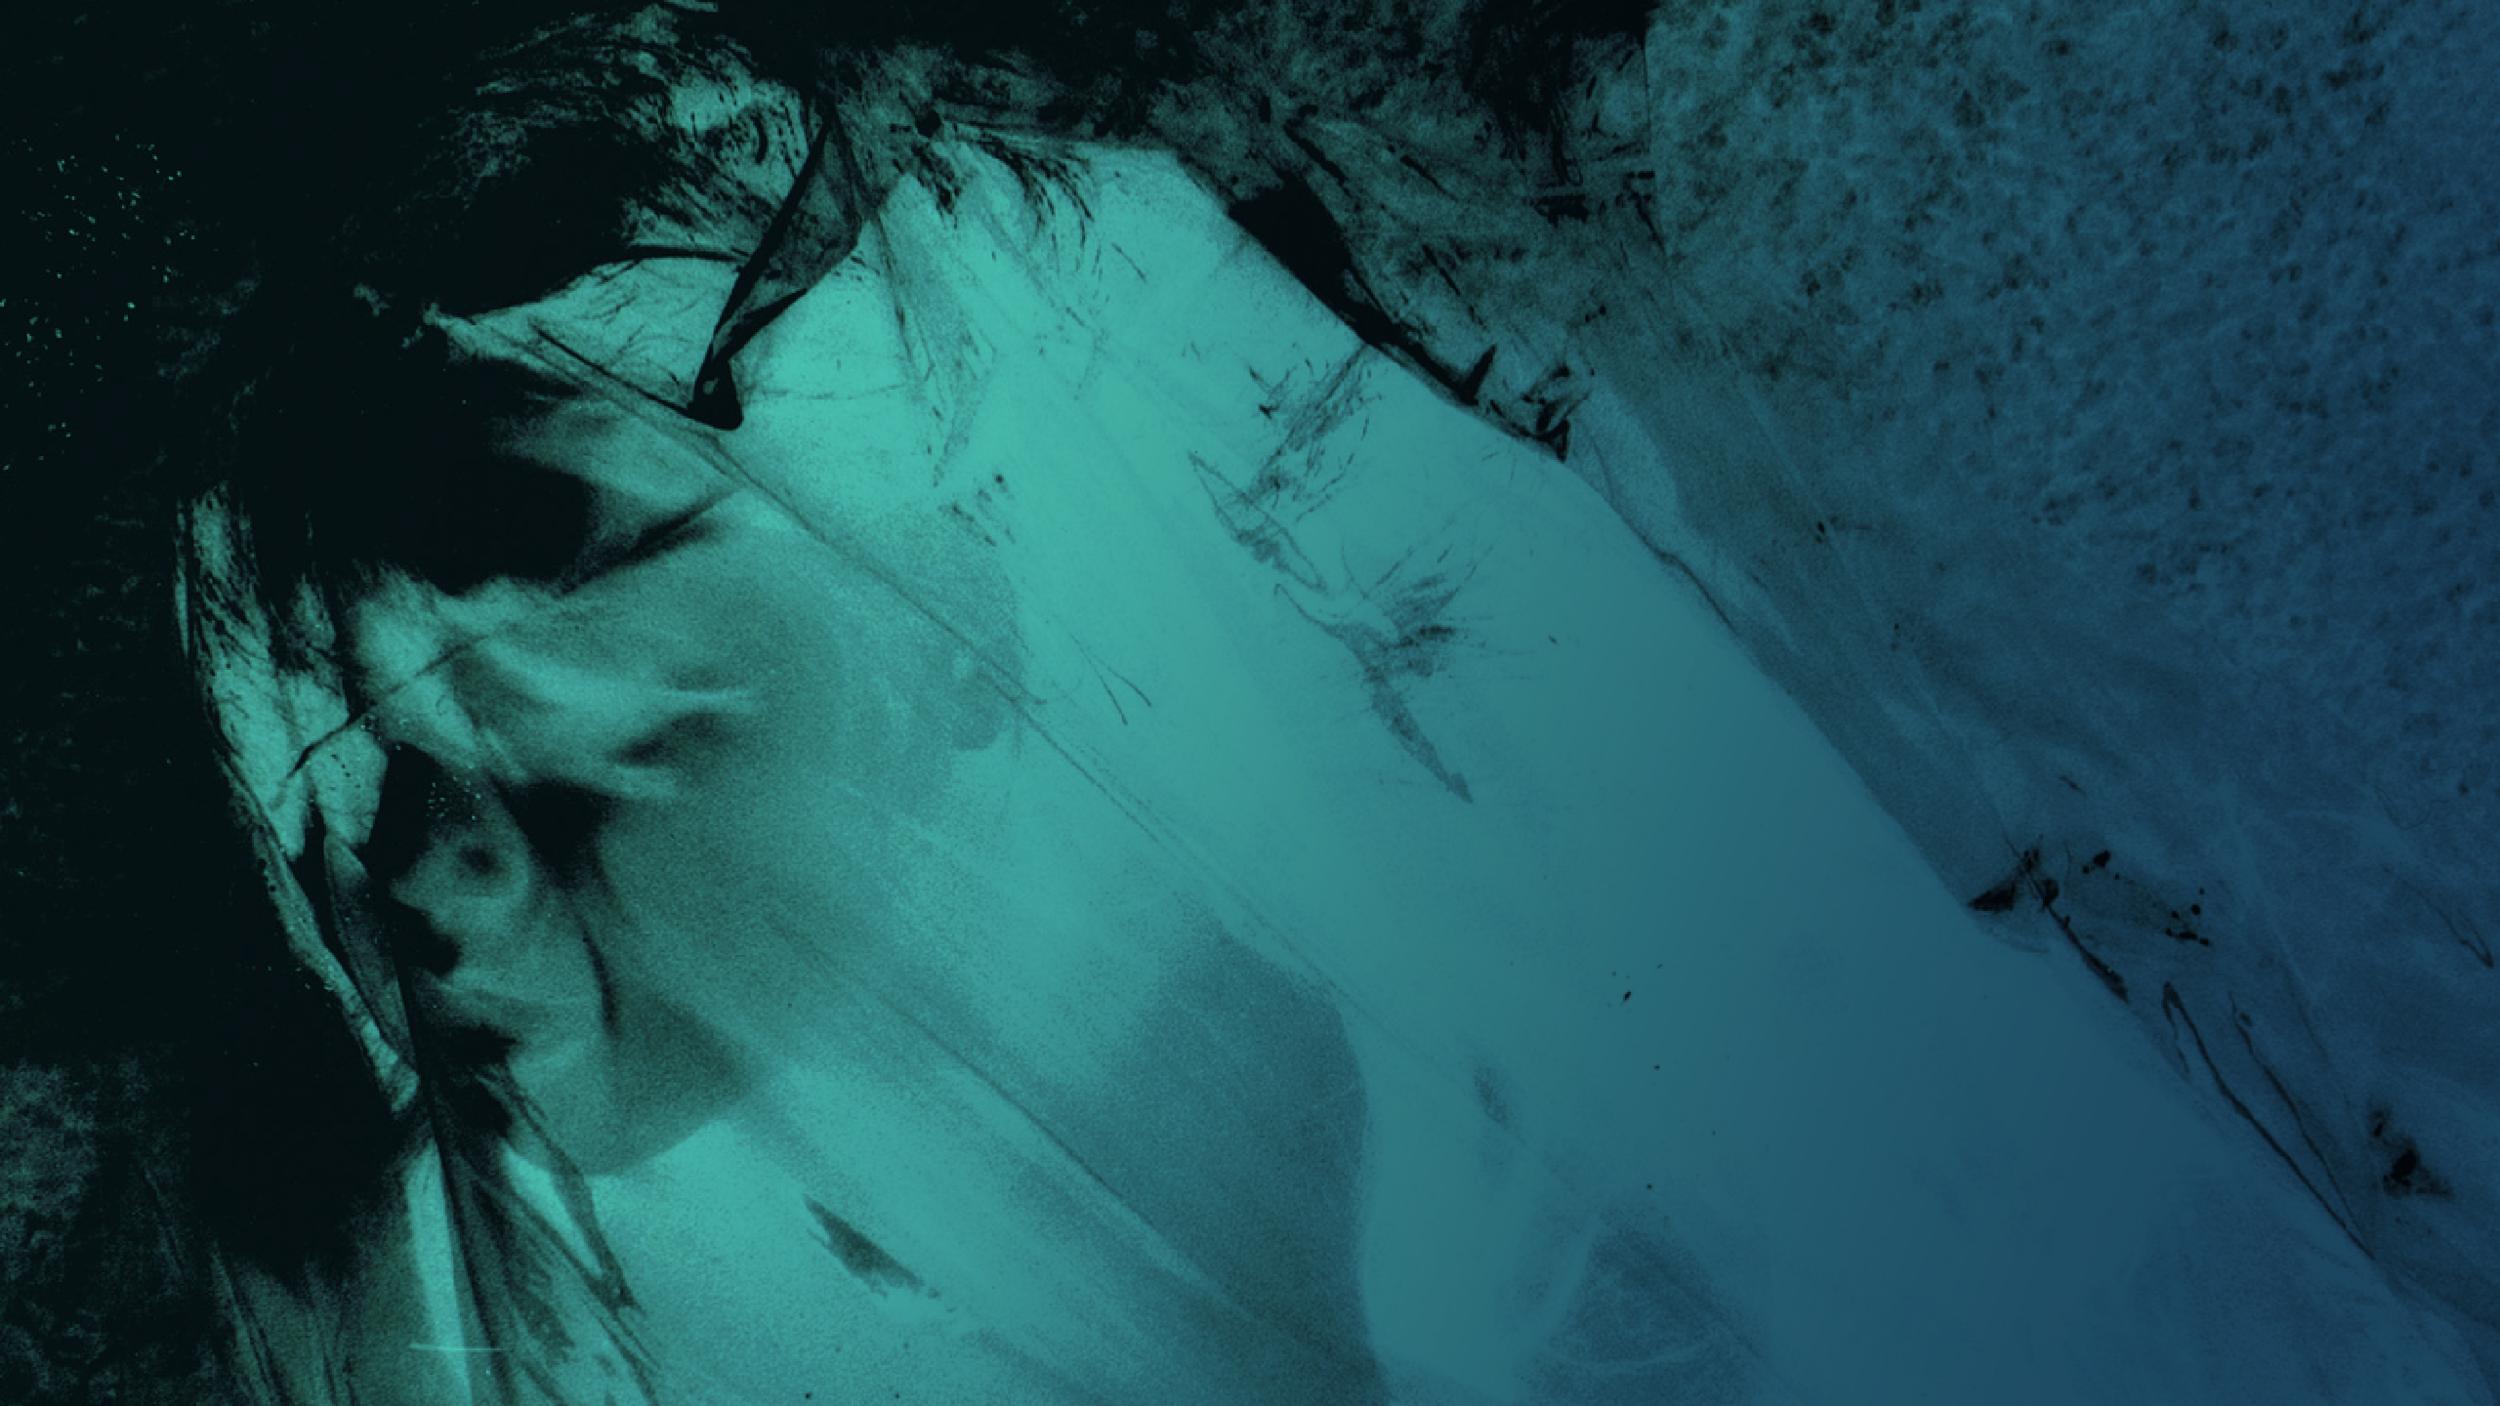 teal-monster-ghost